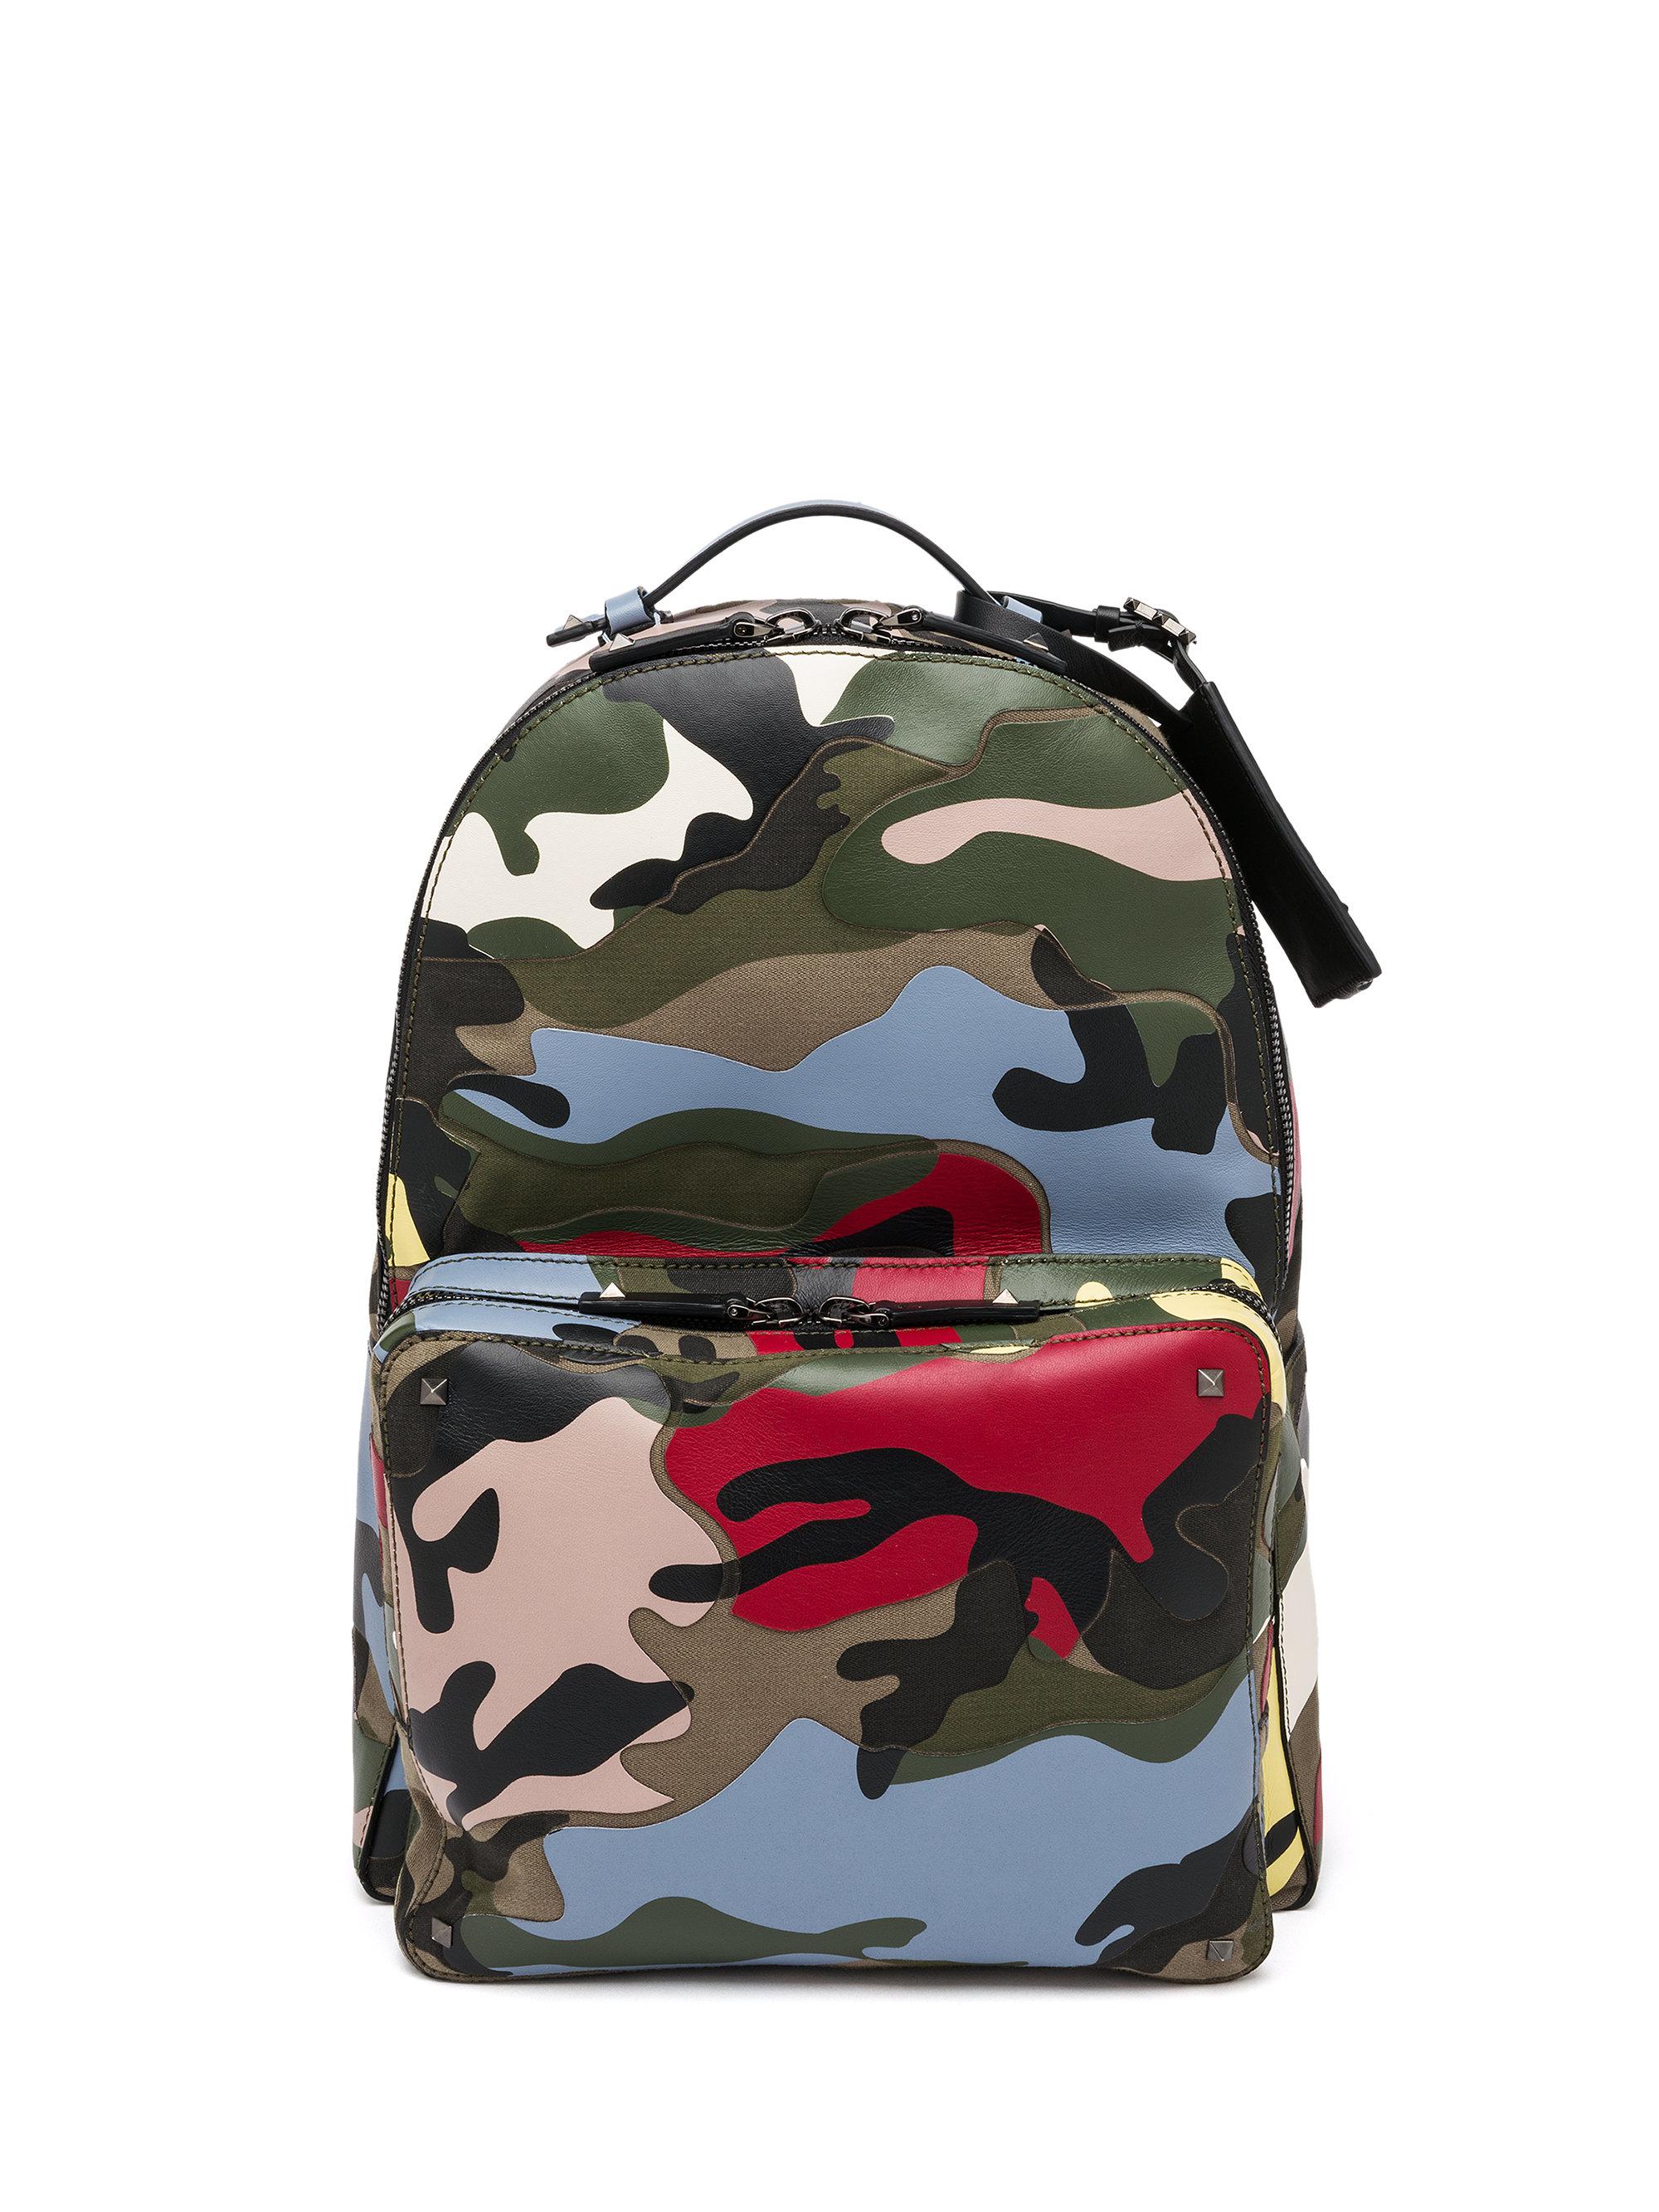 bcb3088590f3 Ralph Lauren Polo Patchwork Camo Canvas Backpack - shape.com